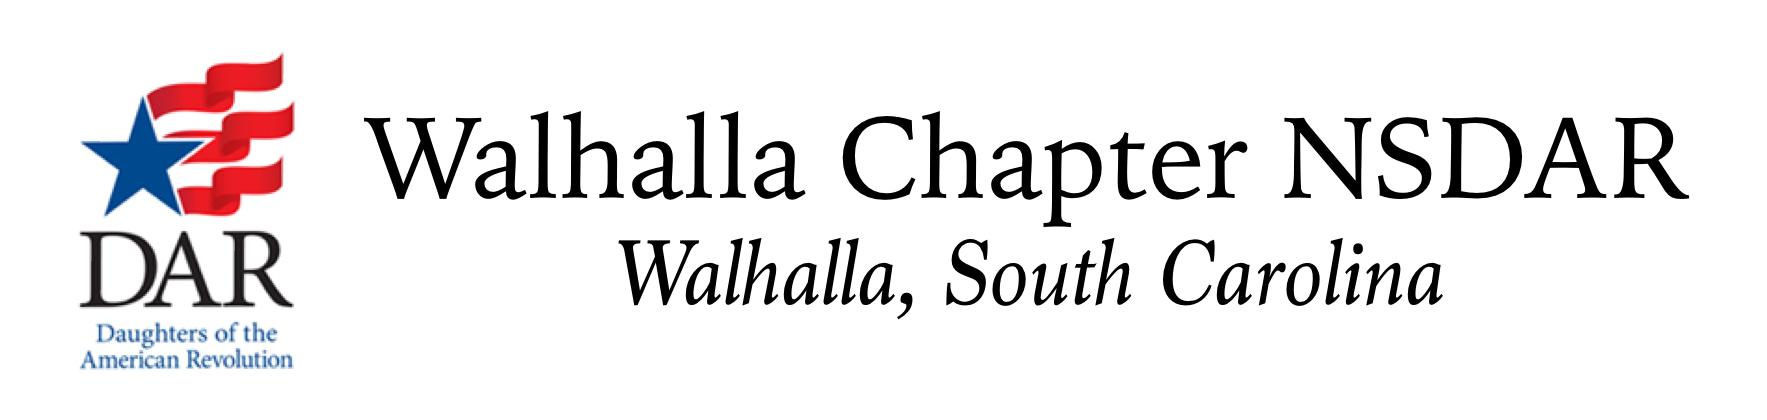 Walhalla Banner.png